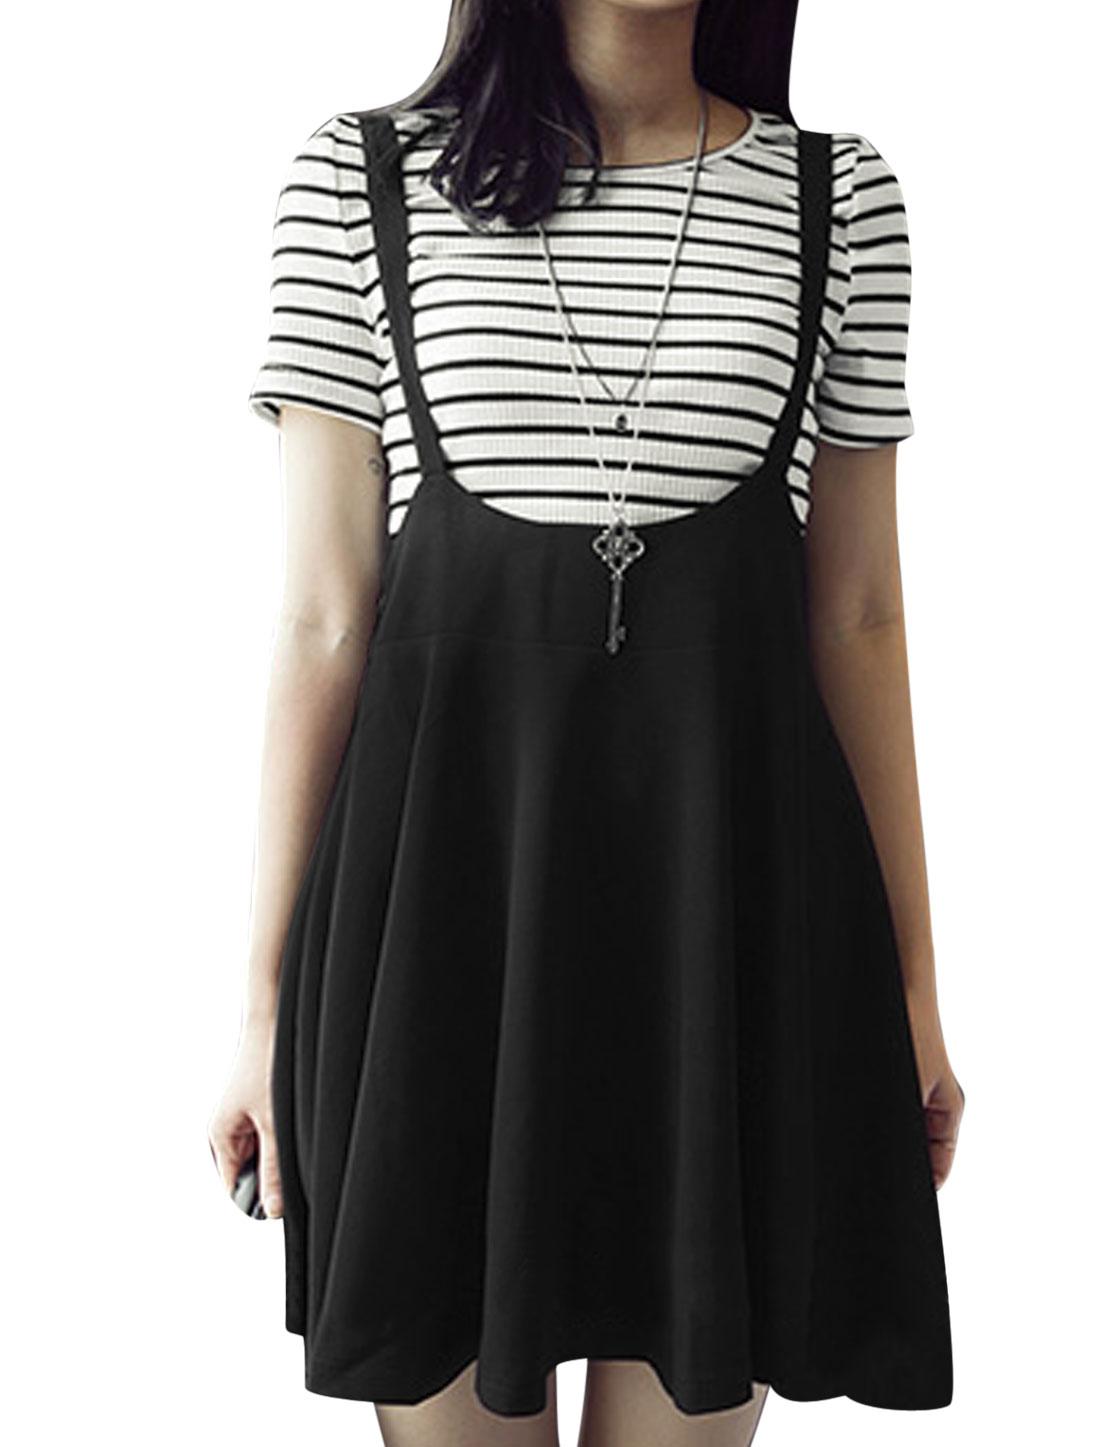 Ladies Short Sleeve Stripes T-Shirt w Suspender Skirt Set White Black XS